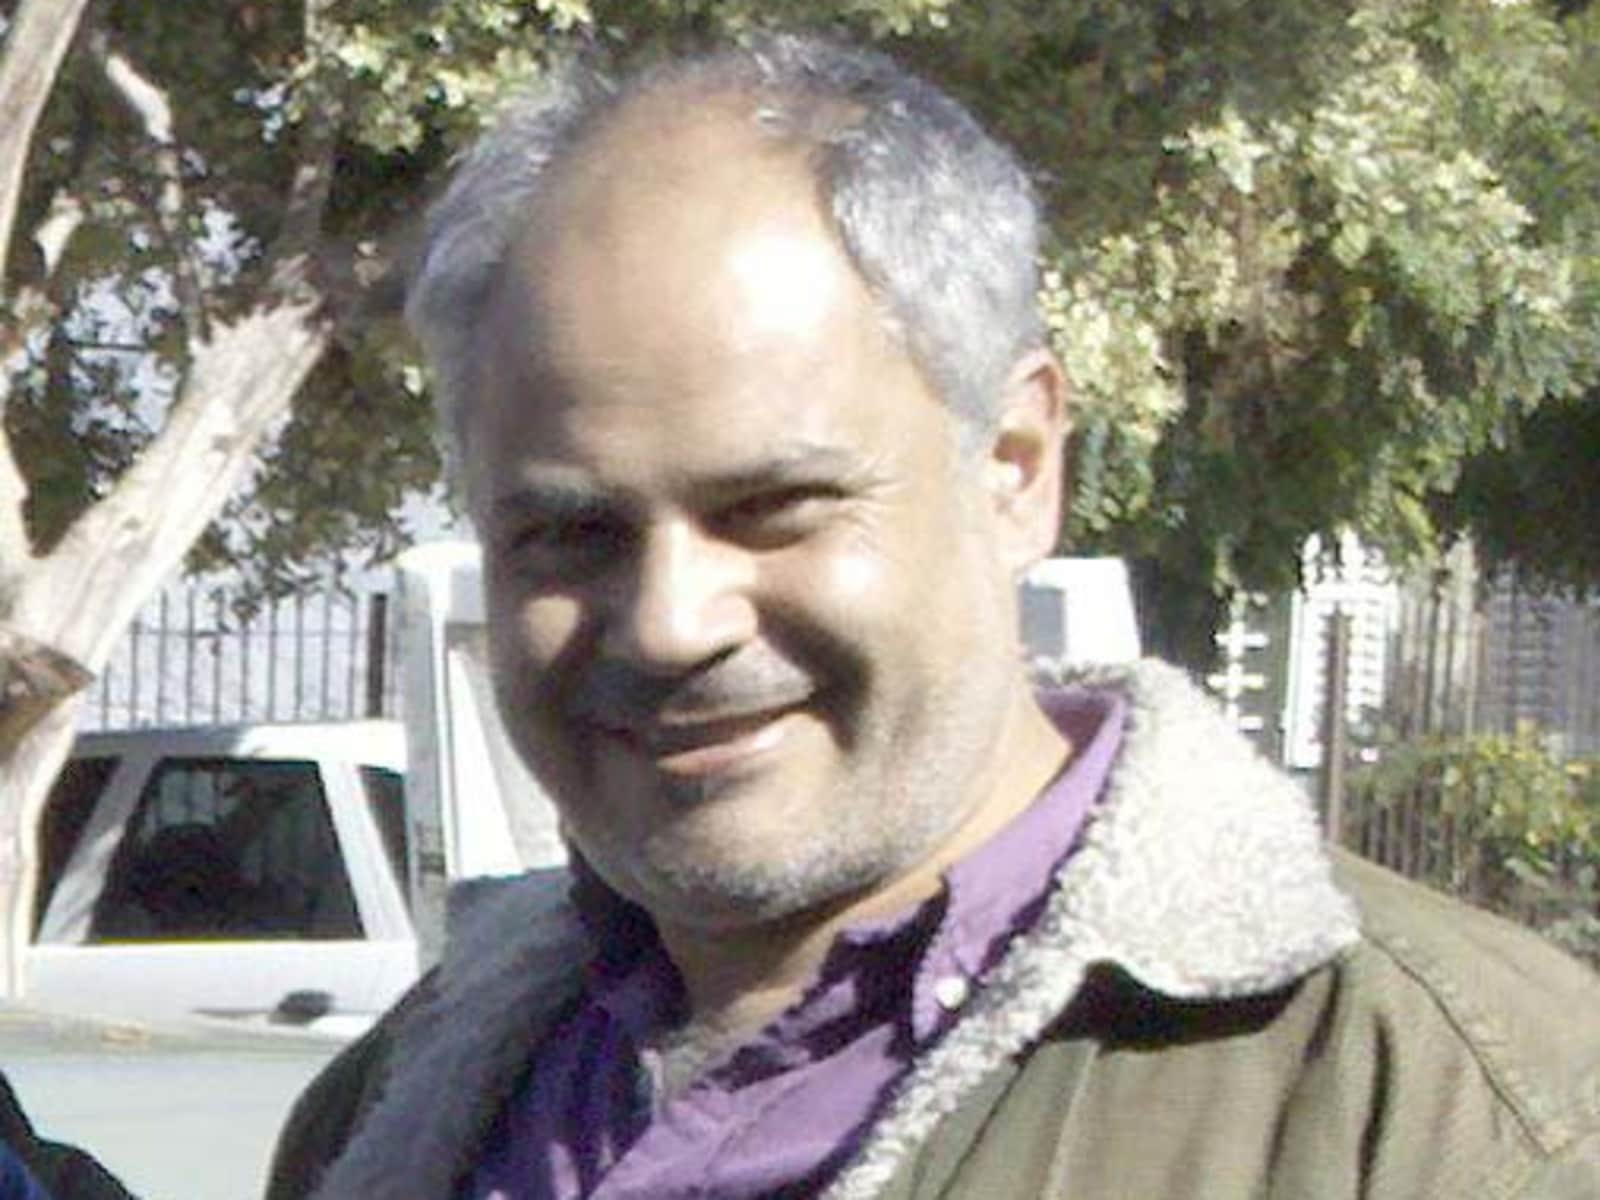 Gerardo from La Plata, Argentina